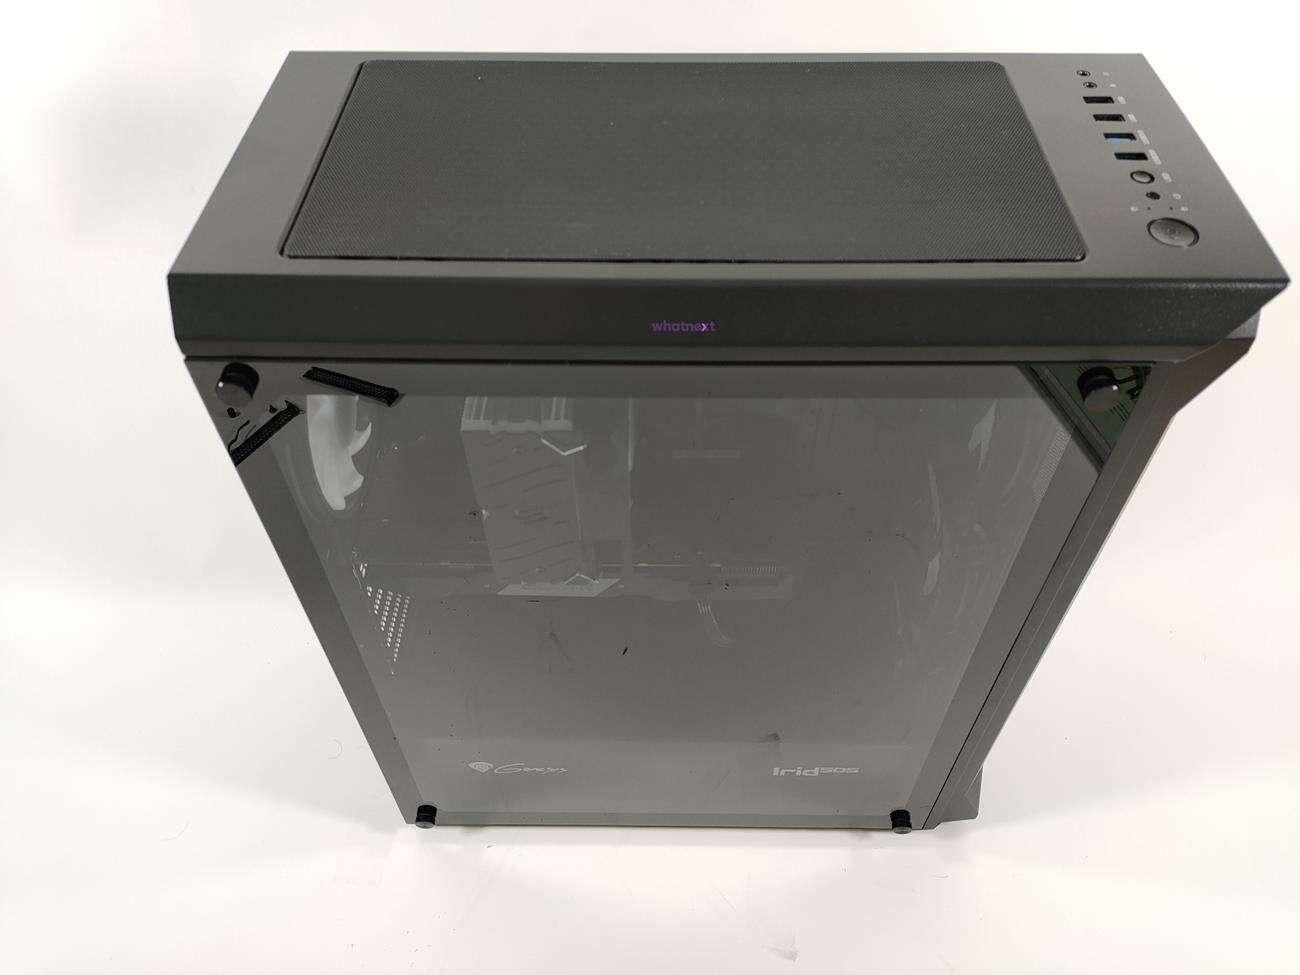 test Genesis Irid 505 ARGB, recenzja Genesis Irid 505 ARGB review Genesis Irid 505 ARGB, opinia Genesis Irid 505 ARGB